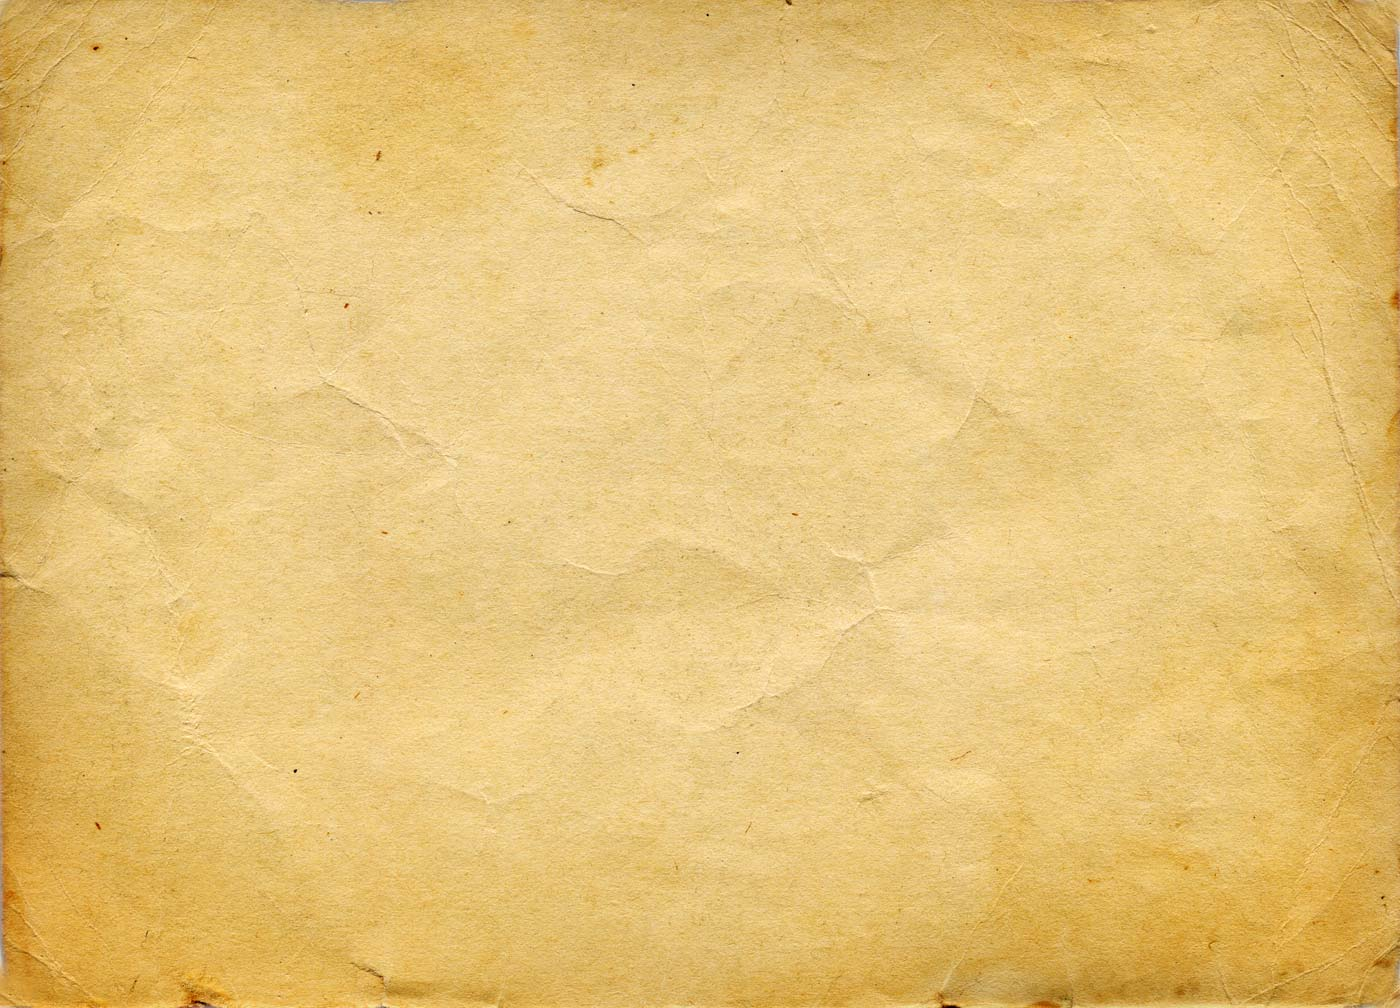 backdrop paper